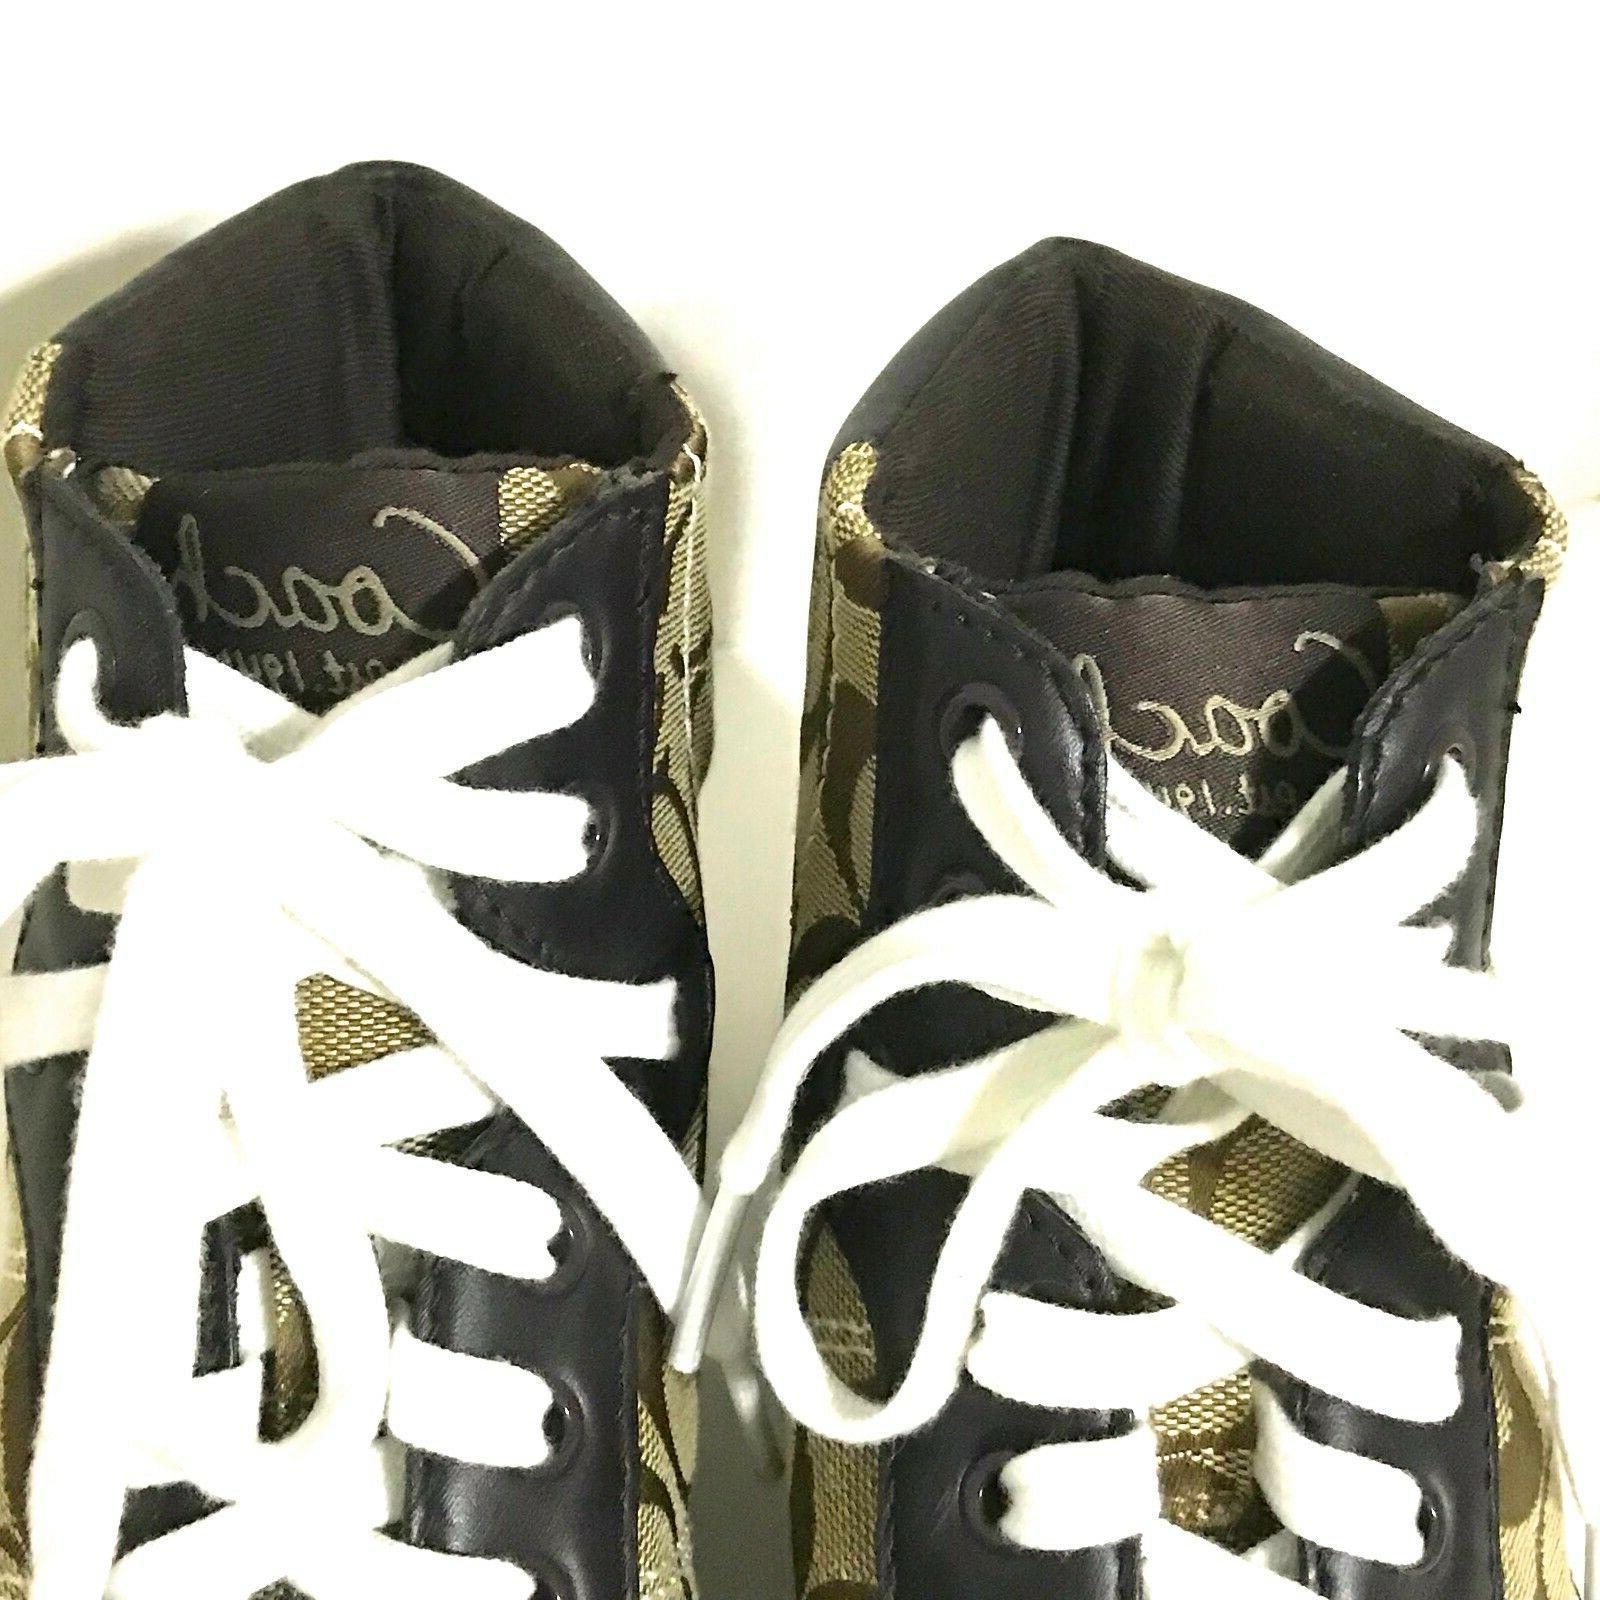 NWOB Coach High Tops Shoes Brown/Tan /